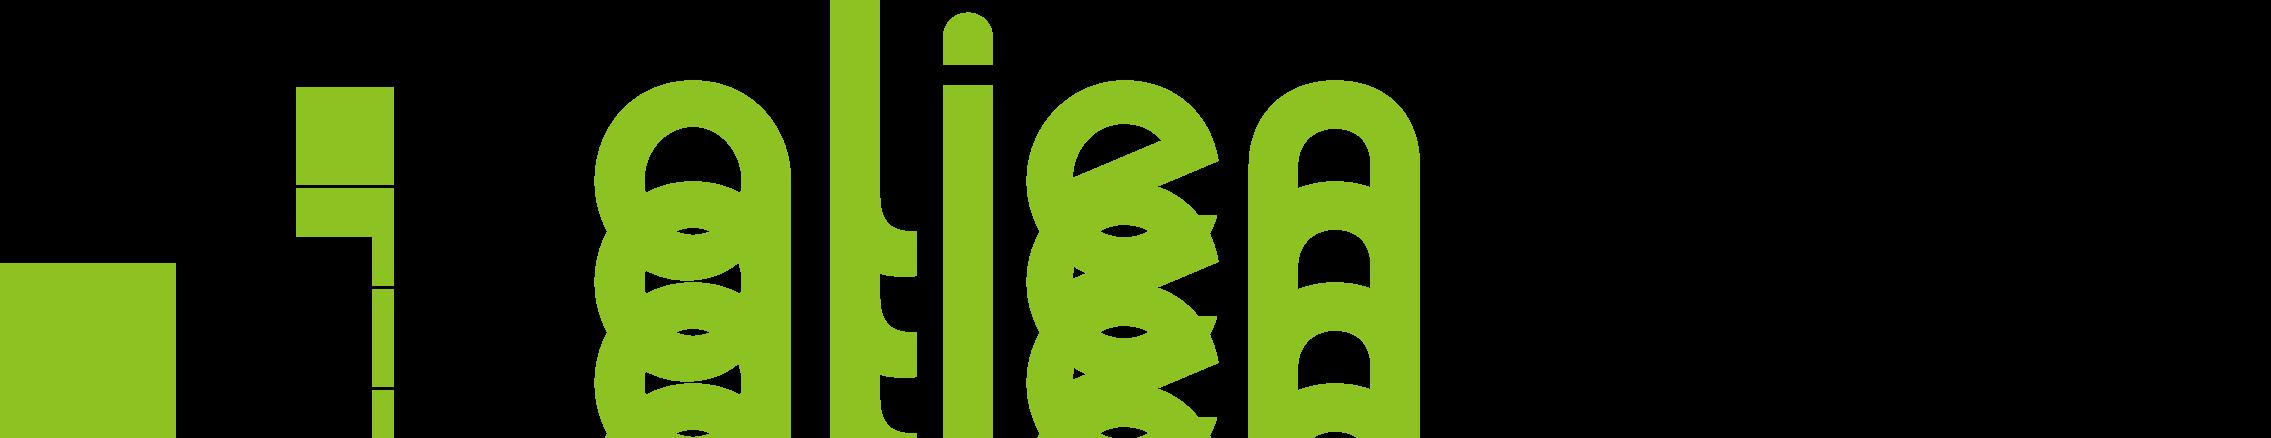 alienvault appoints new emea channel director